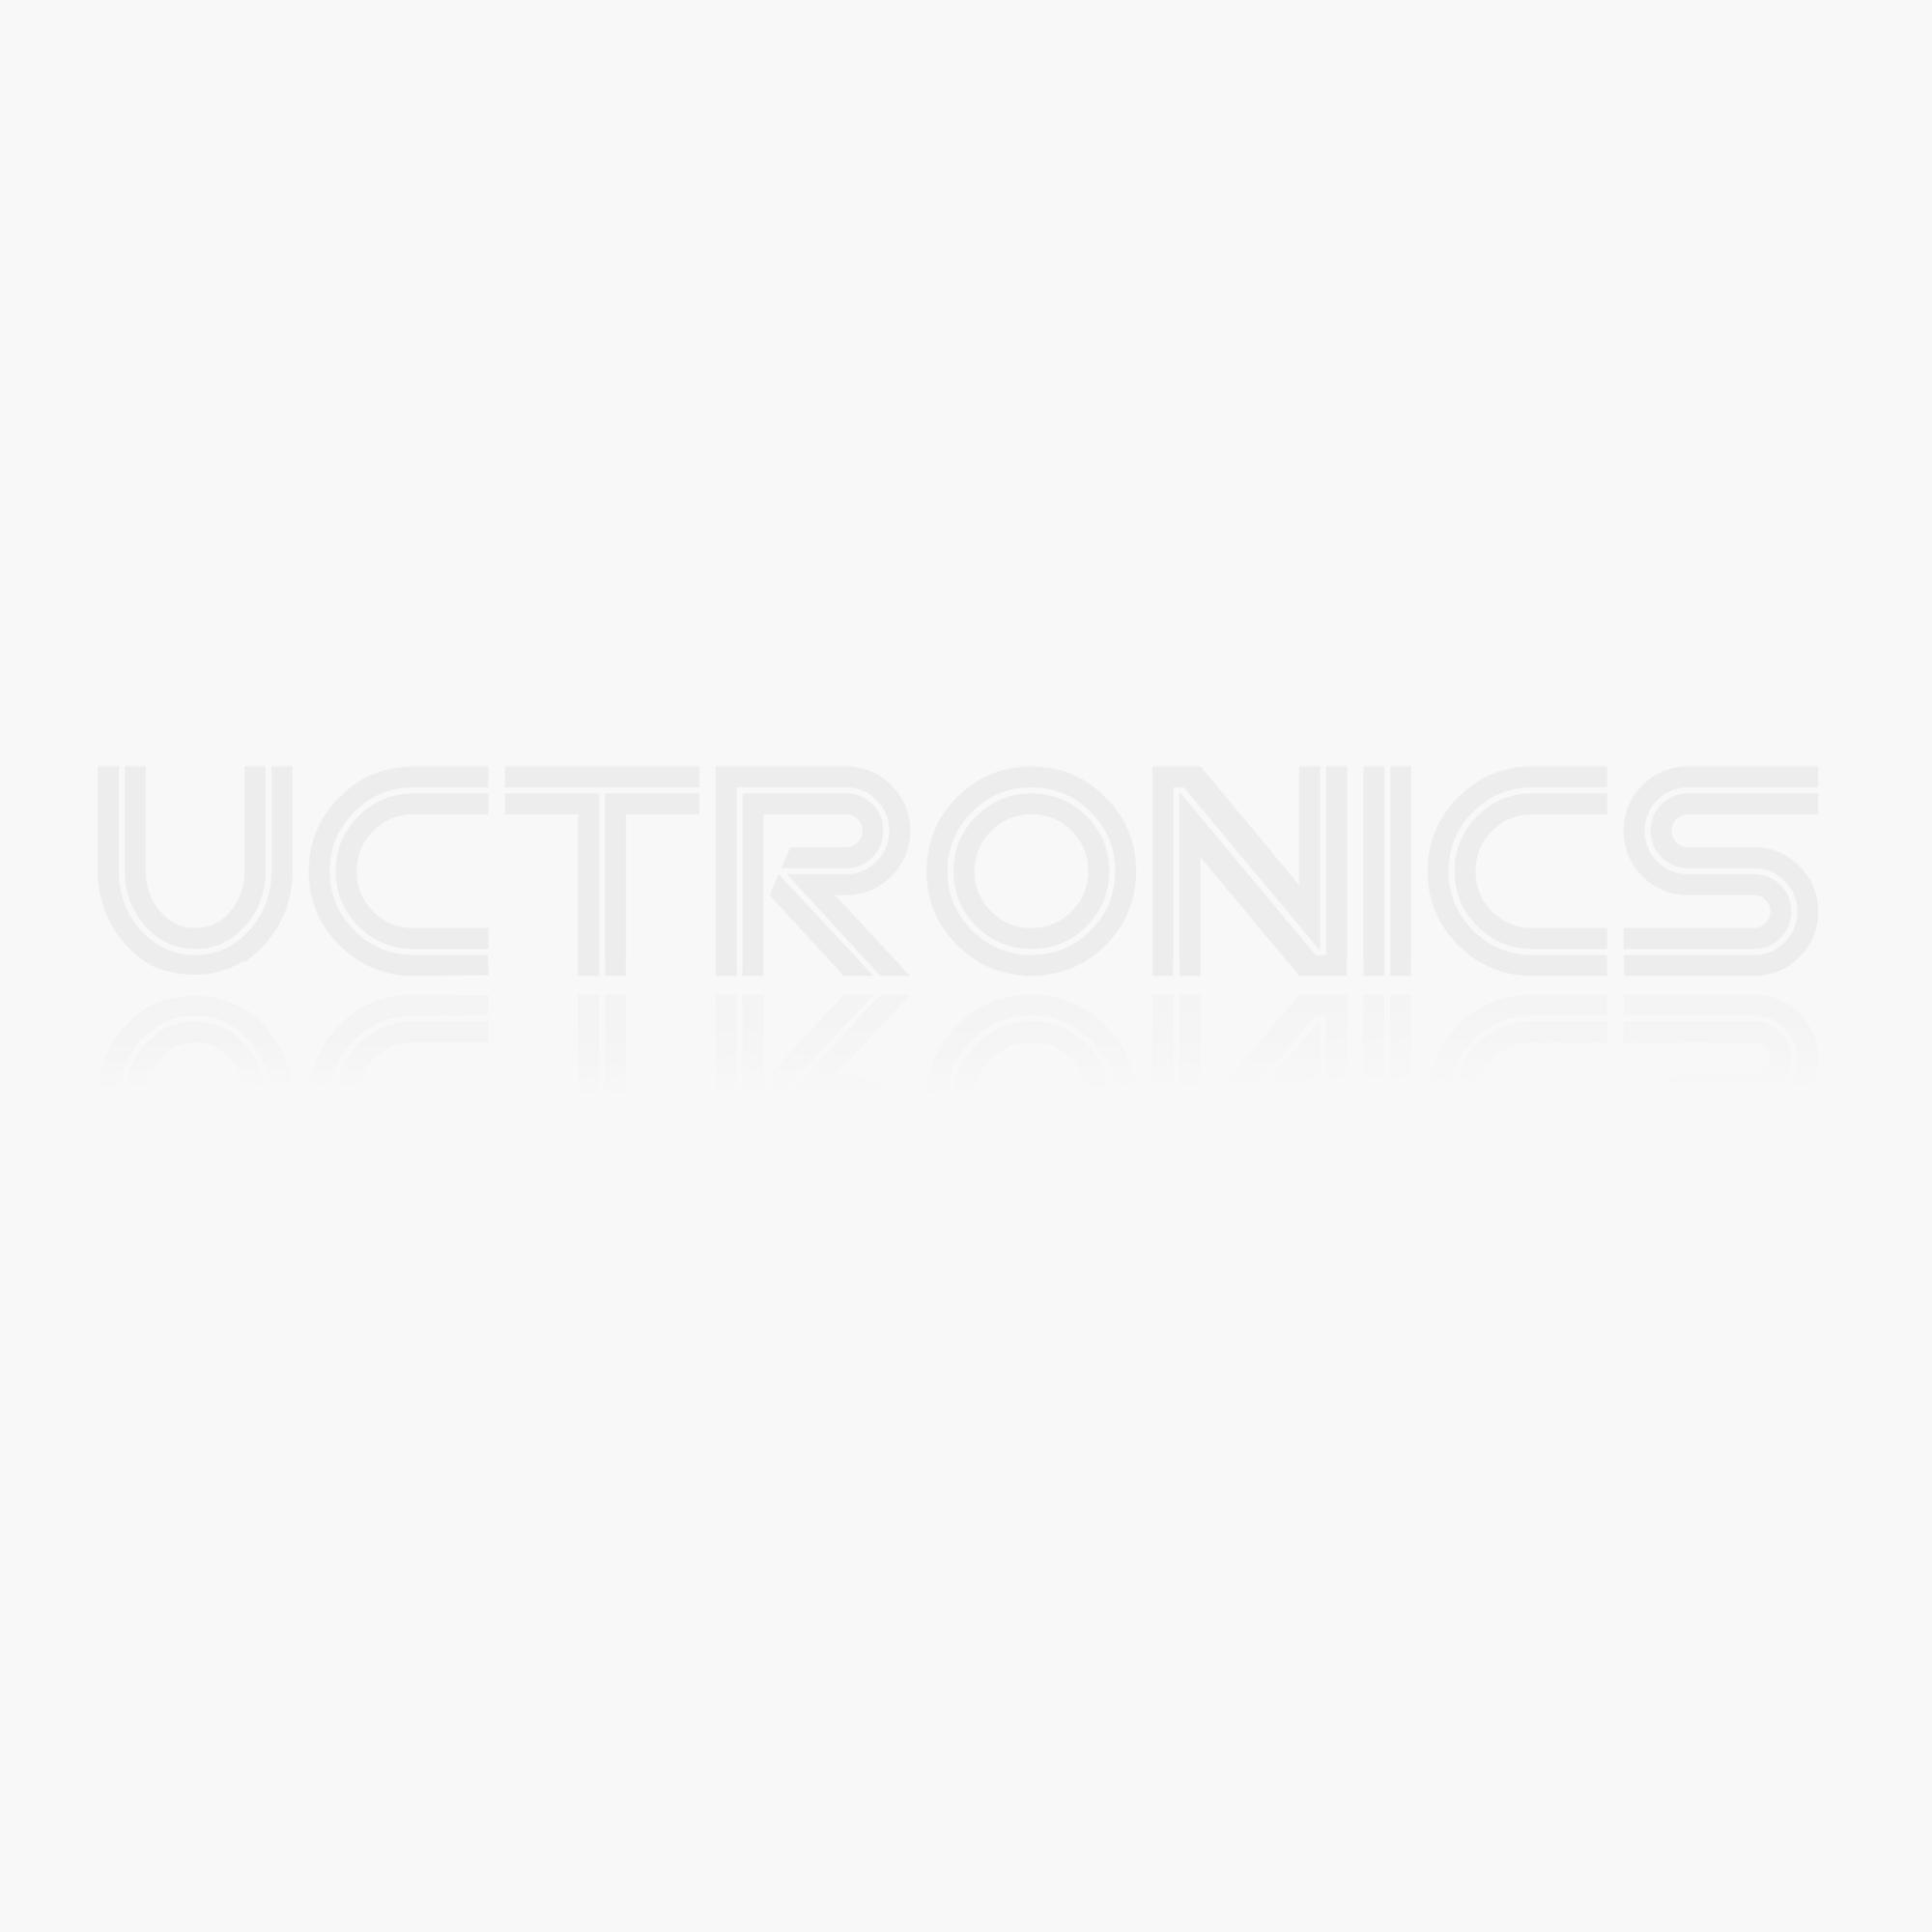 50pcs RUEF500 4A 30V PPTC PolySwitch Resettable Fuse